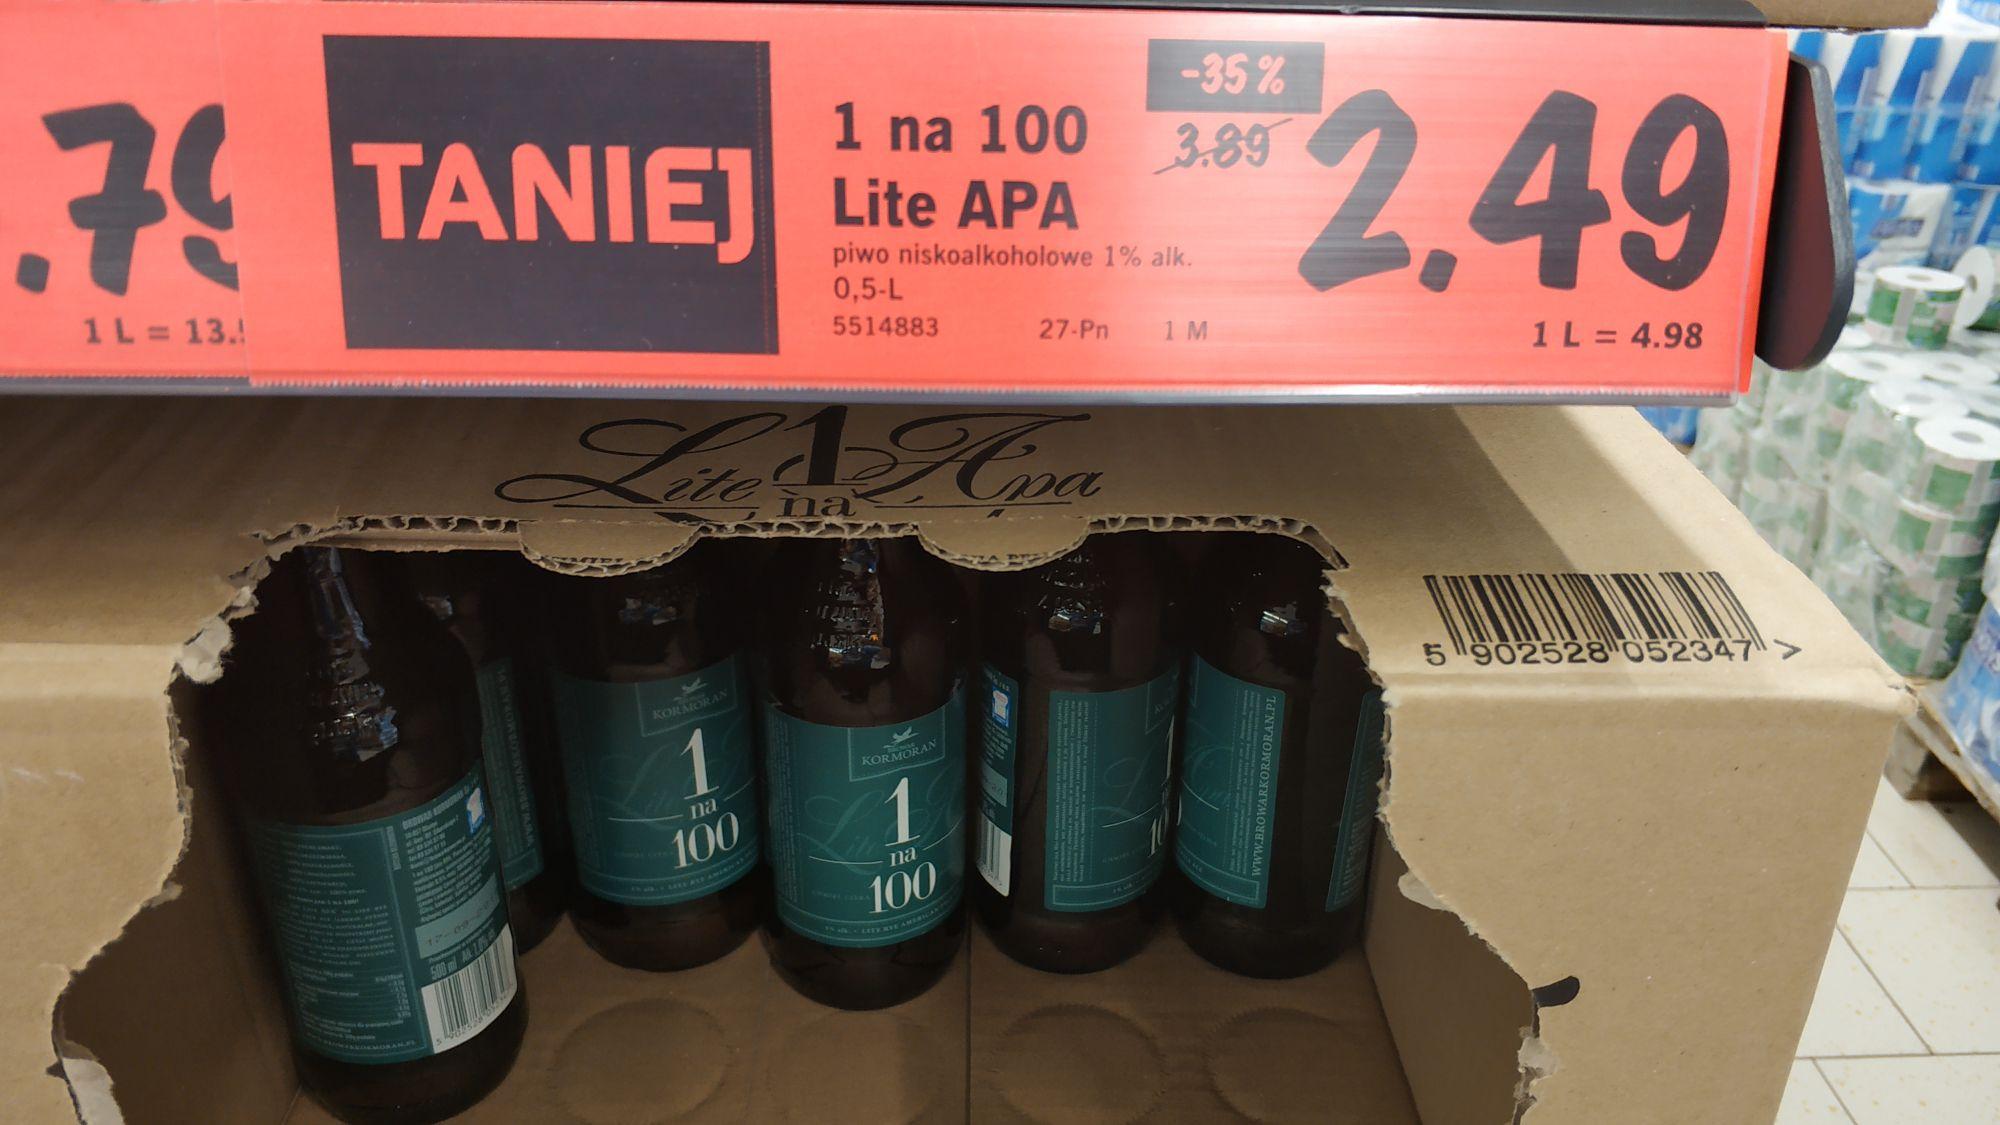 Piwo 1 na 100 Lite APA 0.5L Browar  Kormoran. Lidl Lubin.